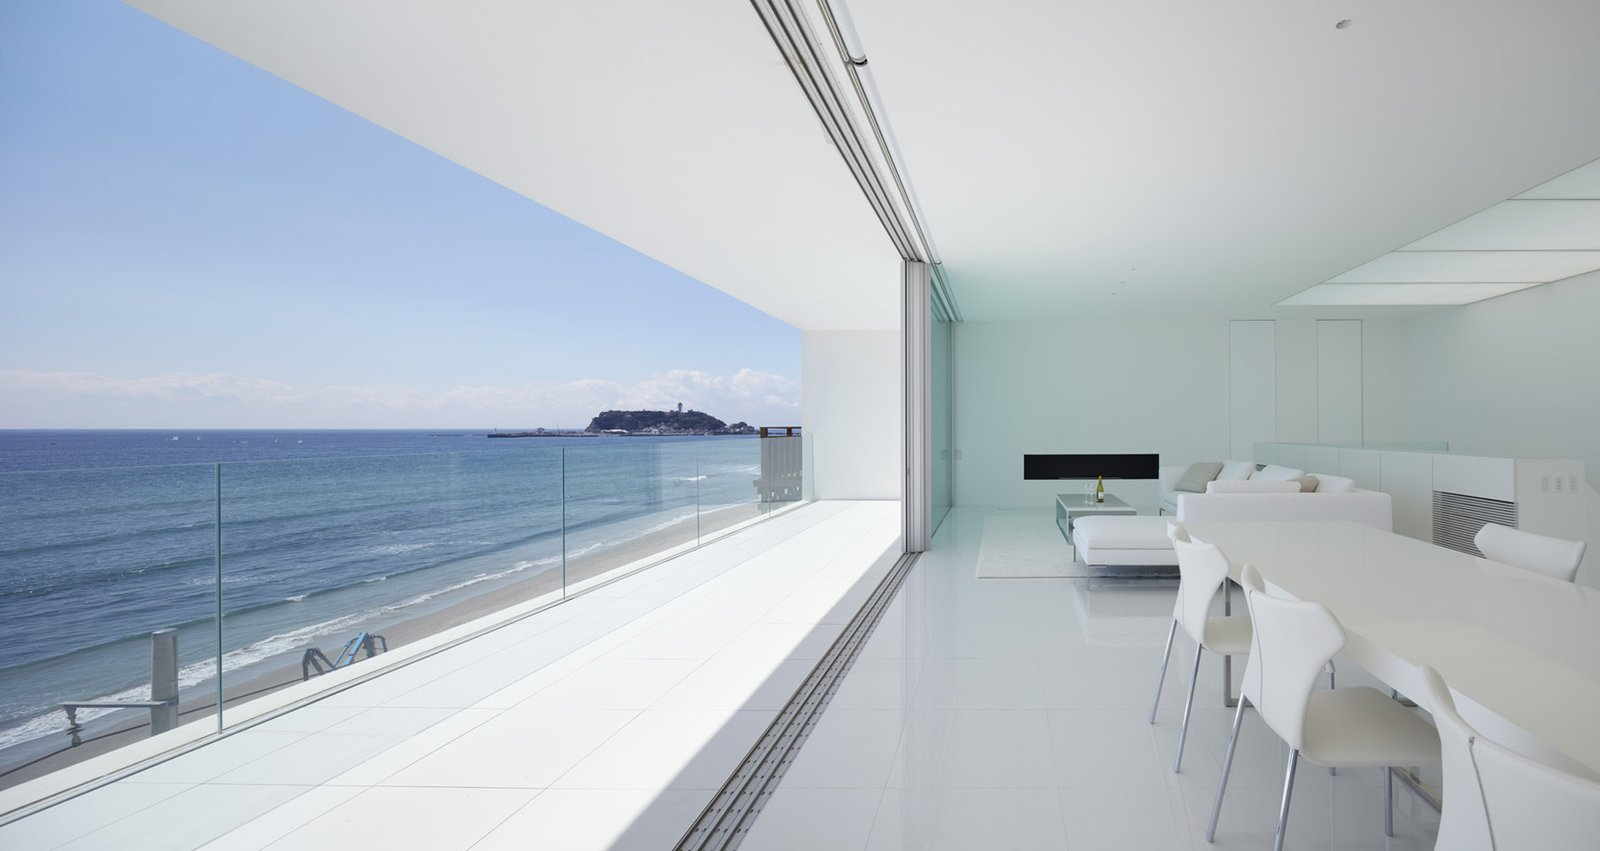 Seaside House by Leibal